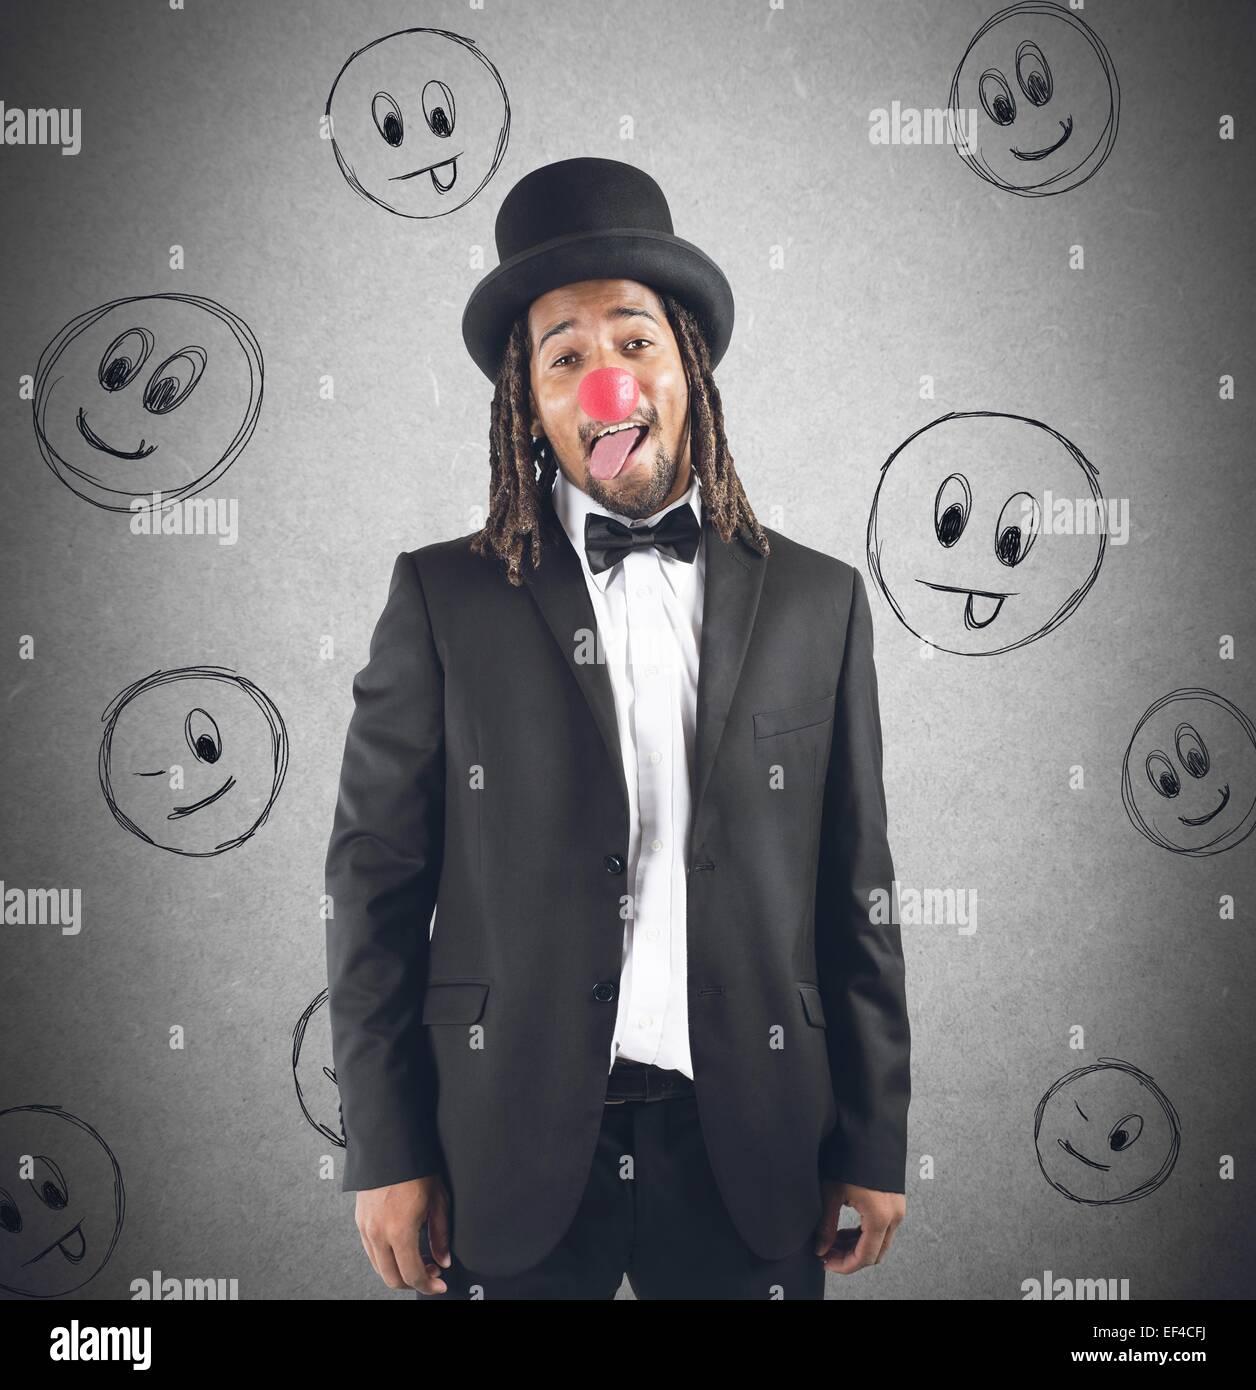 Clown grimacing - Stock Image